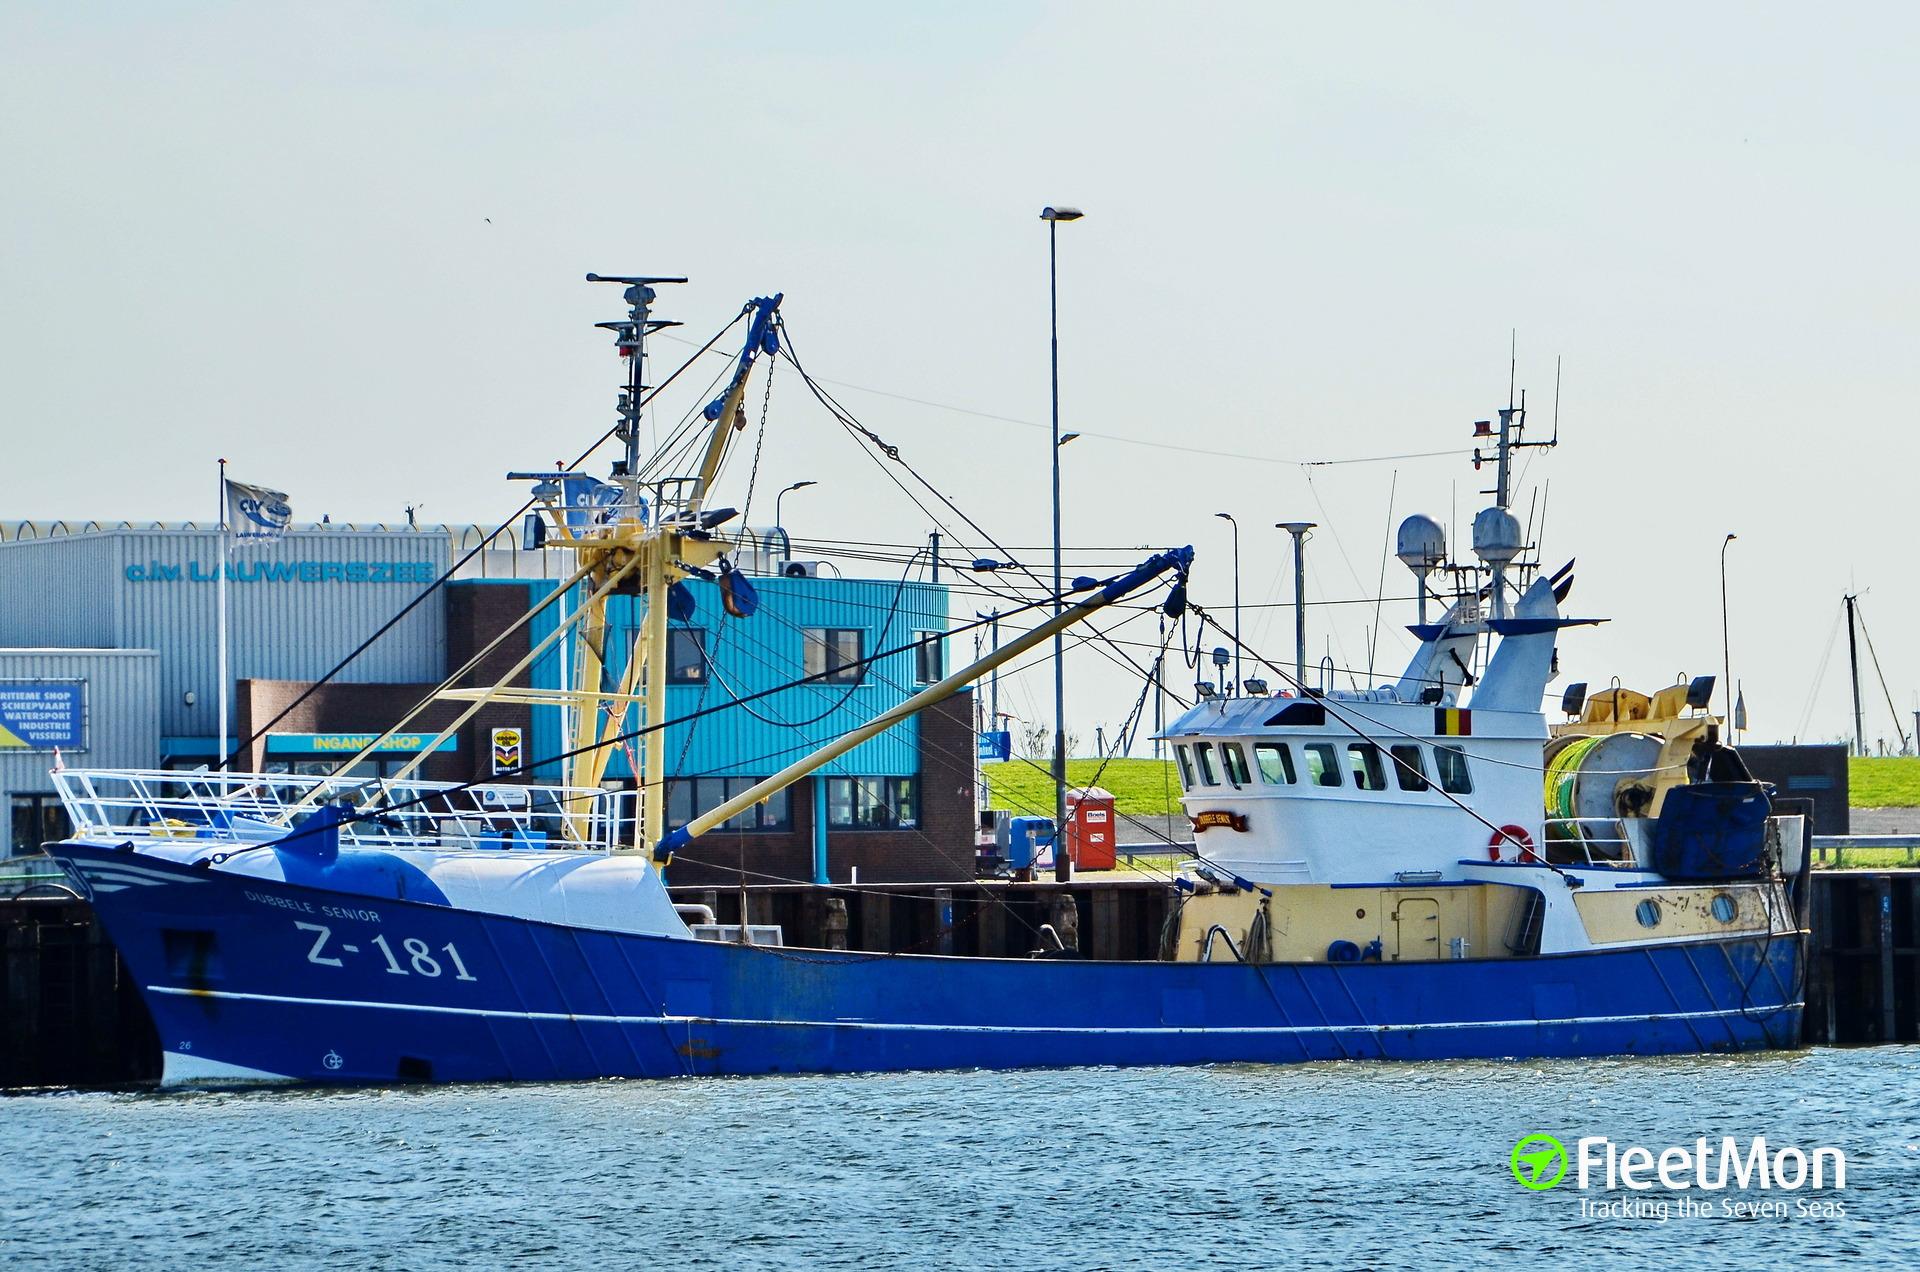 300 kilos of cocaine found on Belgium fishing vessel